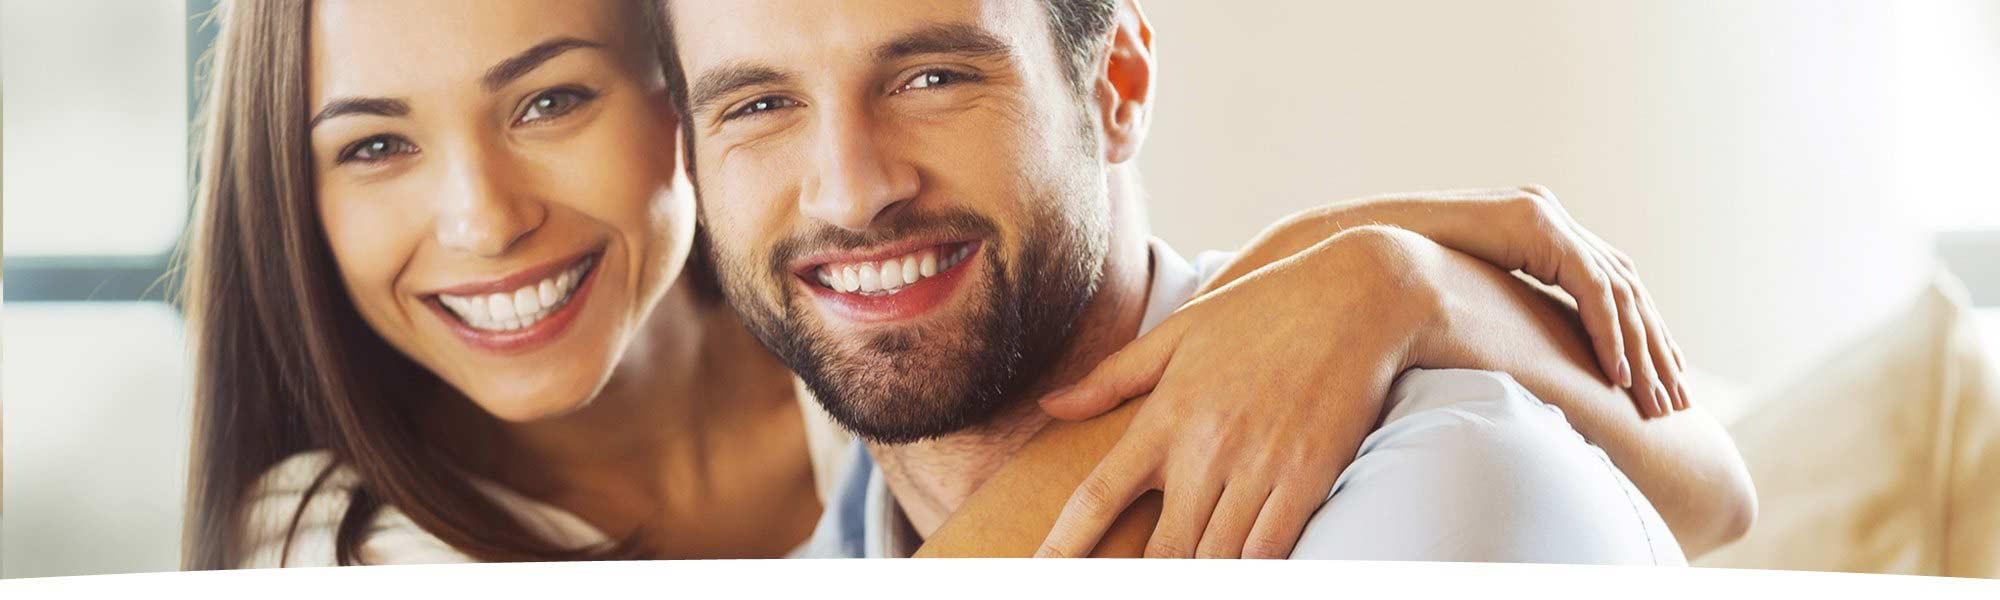 Scoliosis Treatment Programs